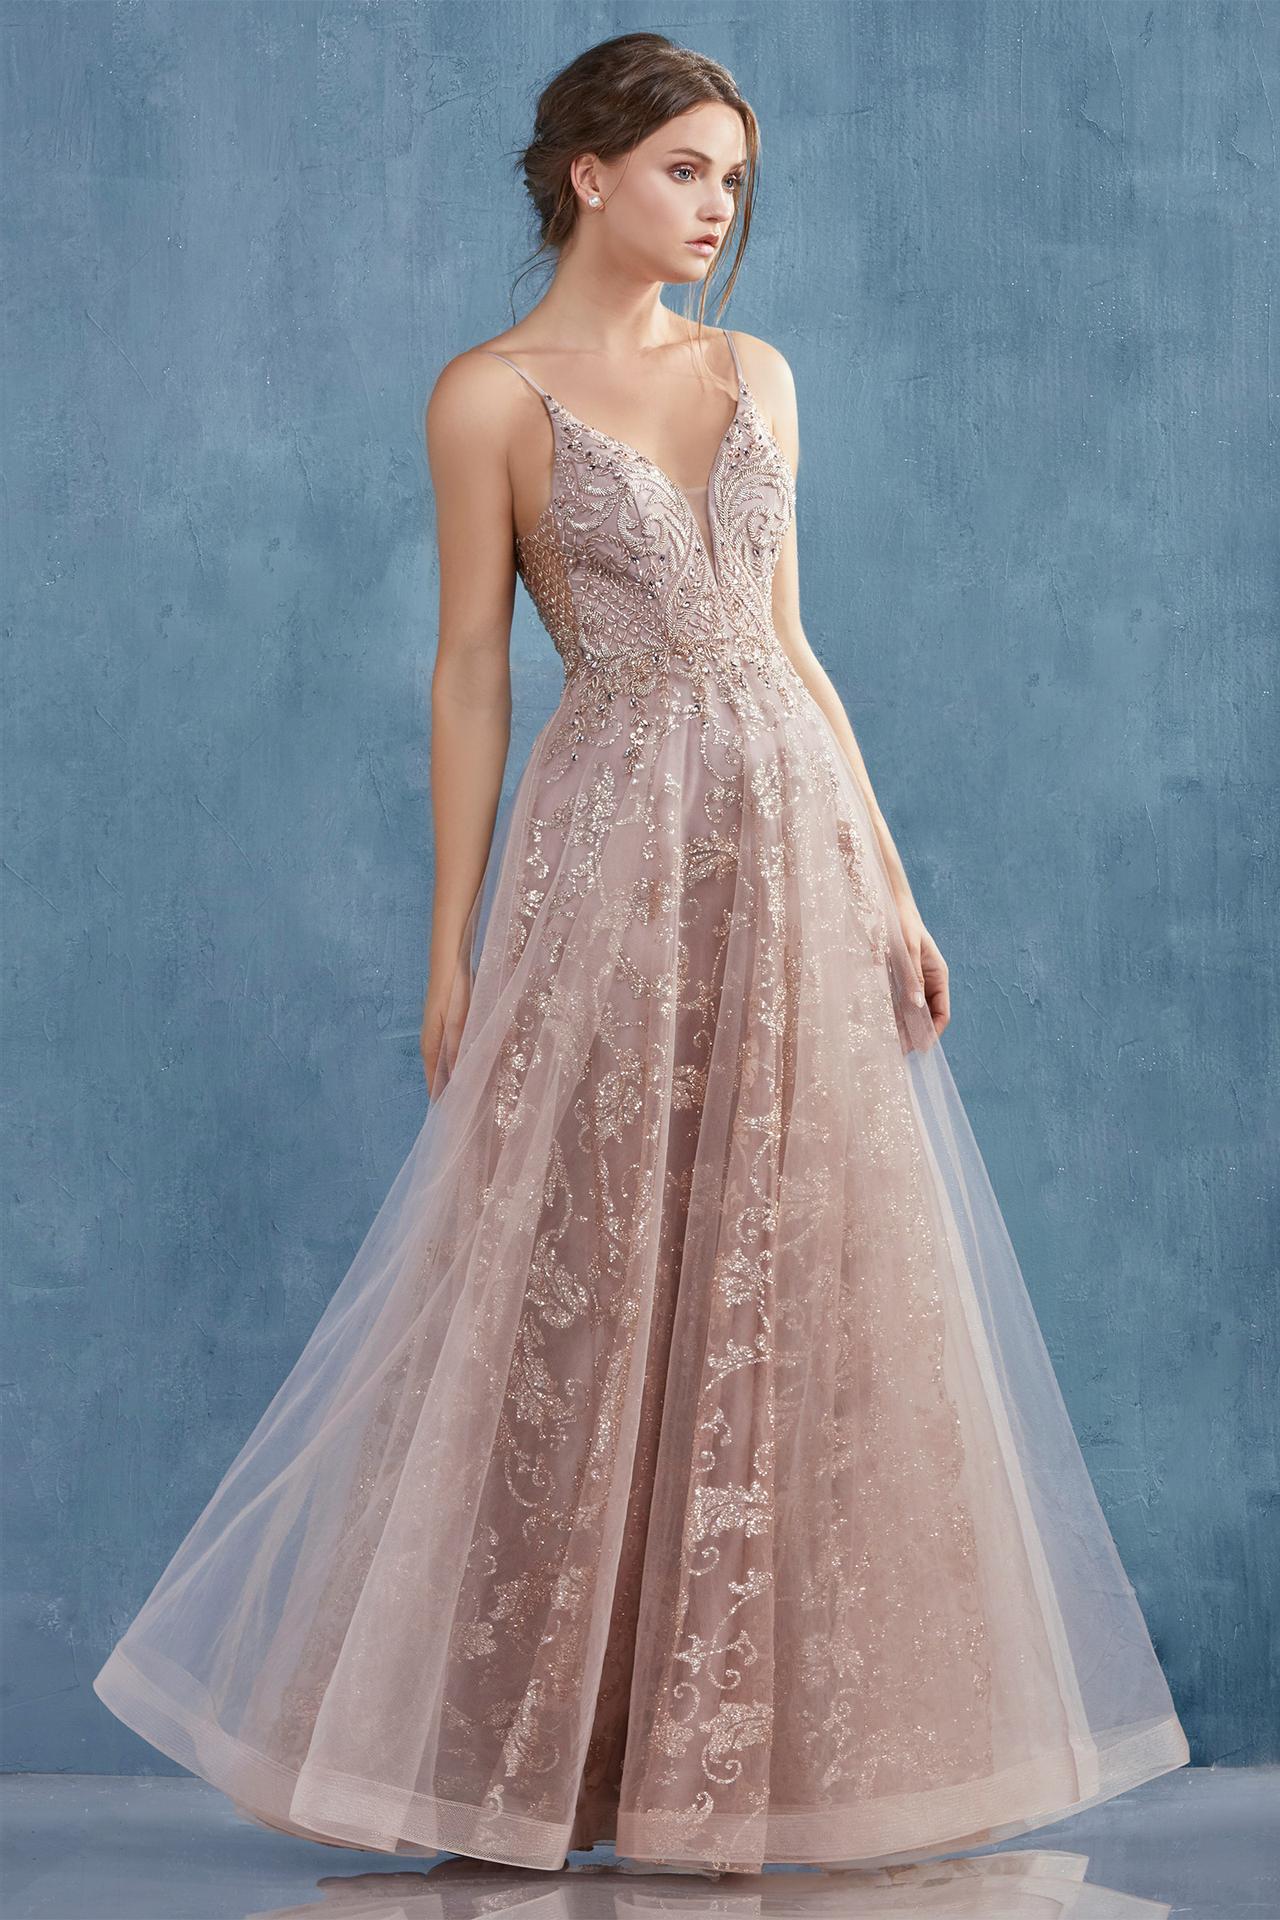 Nové spoločenské šaty :) - Obrázok č. 54